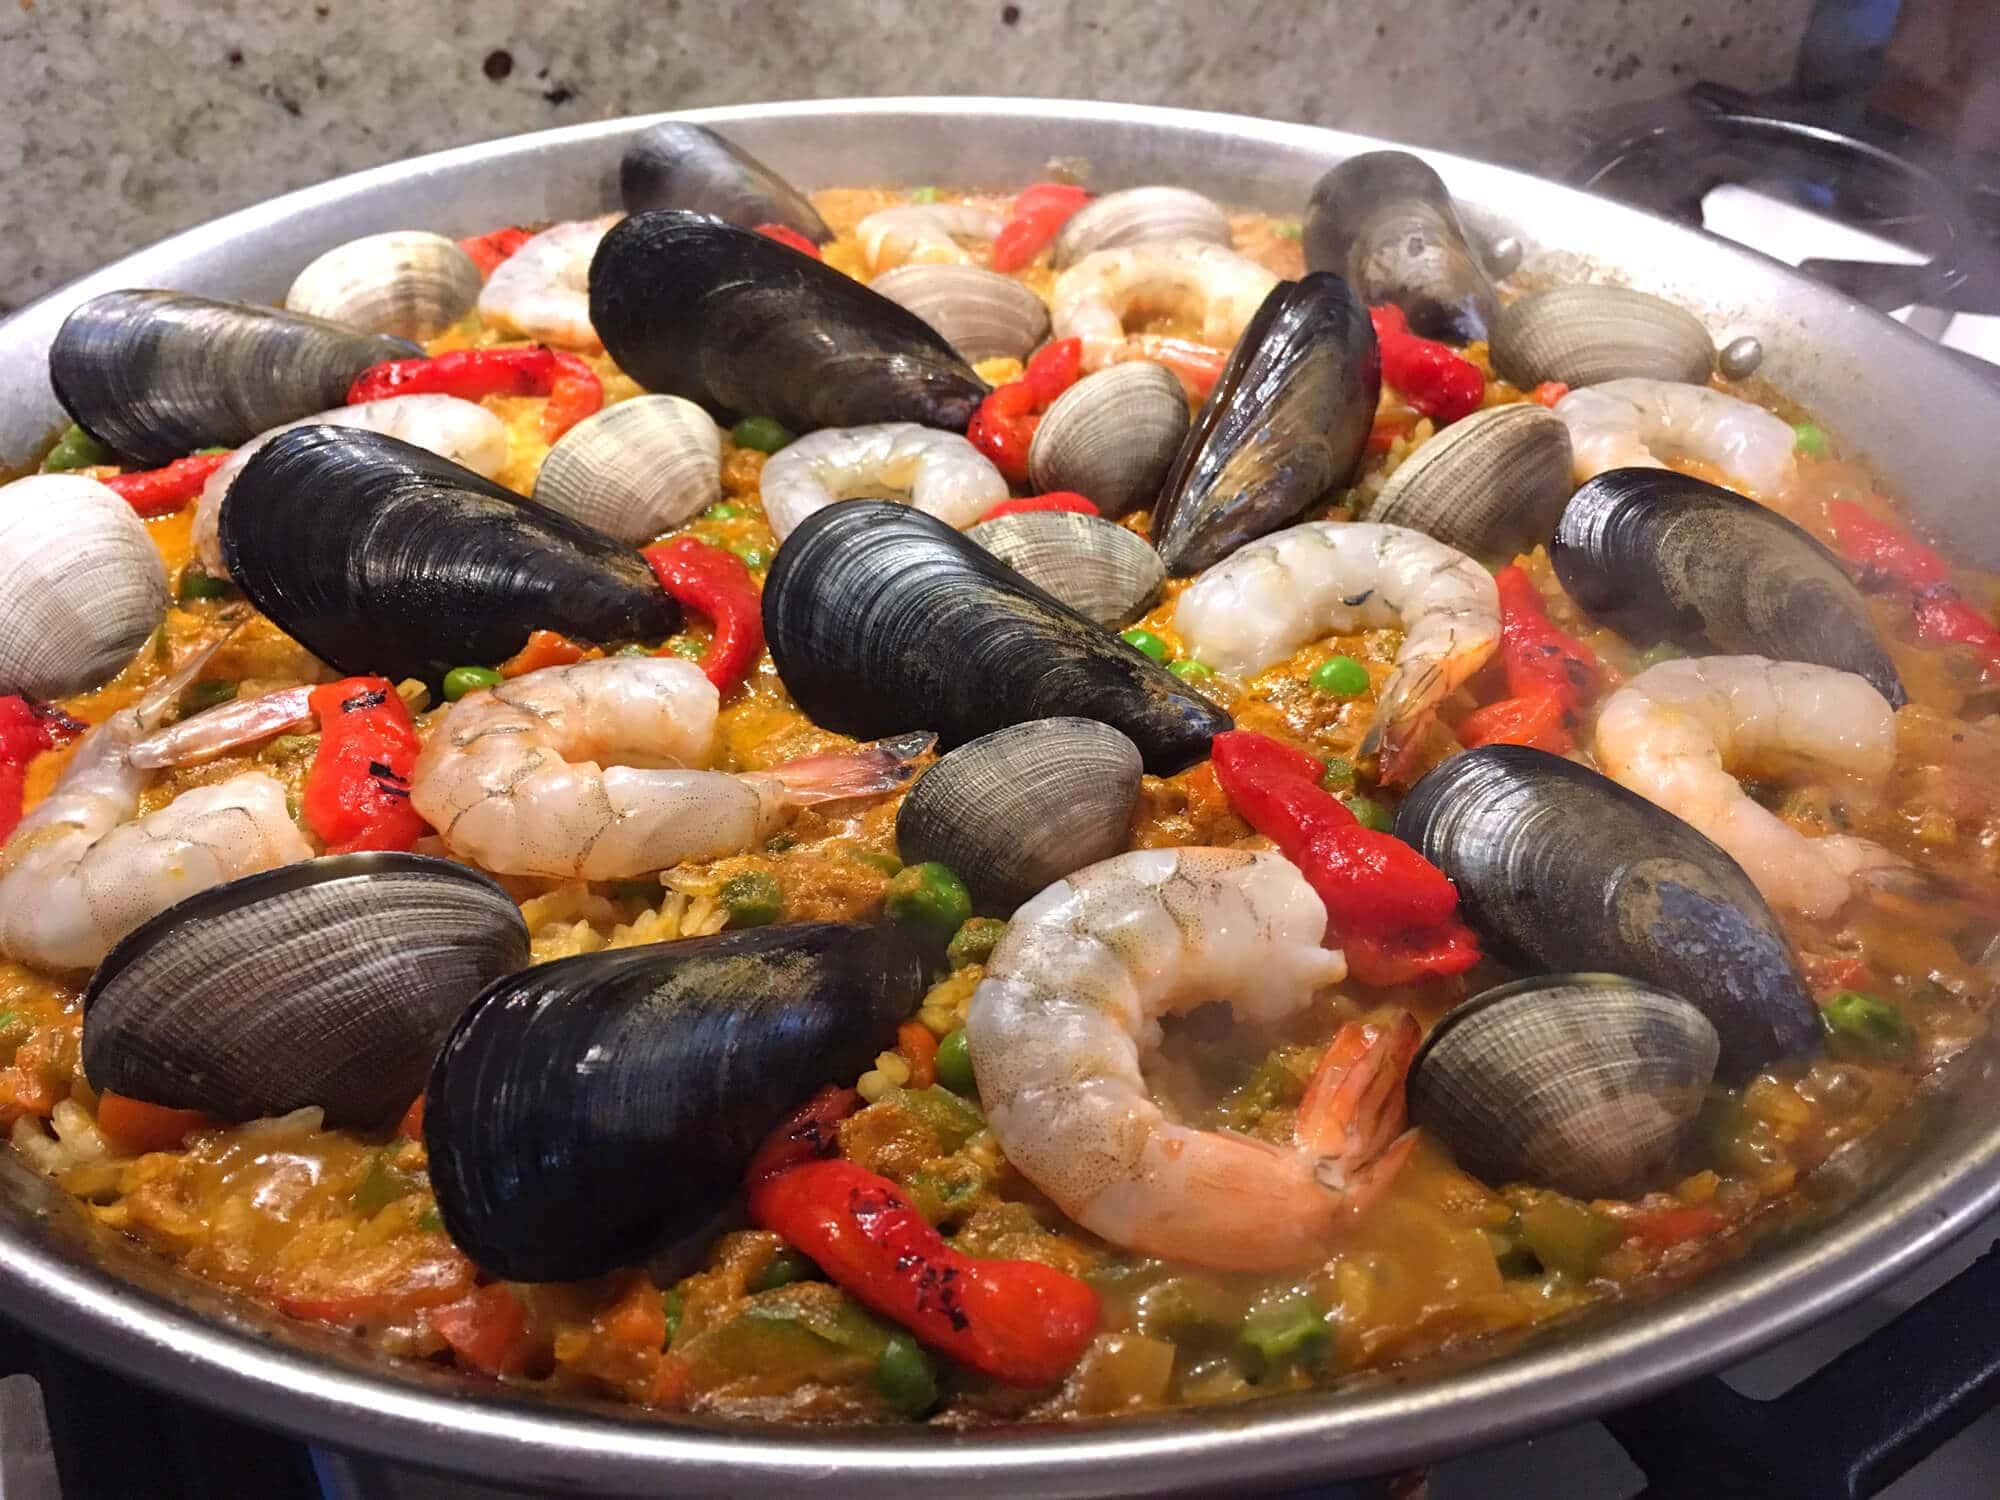 Top Seafood Paella (Paella de Marisco) - The Daring Gourmet XW01